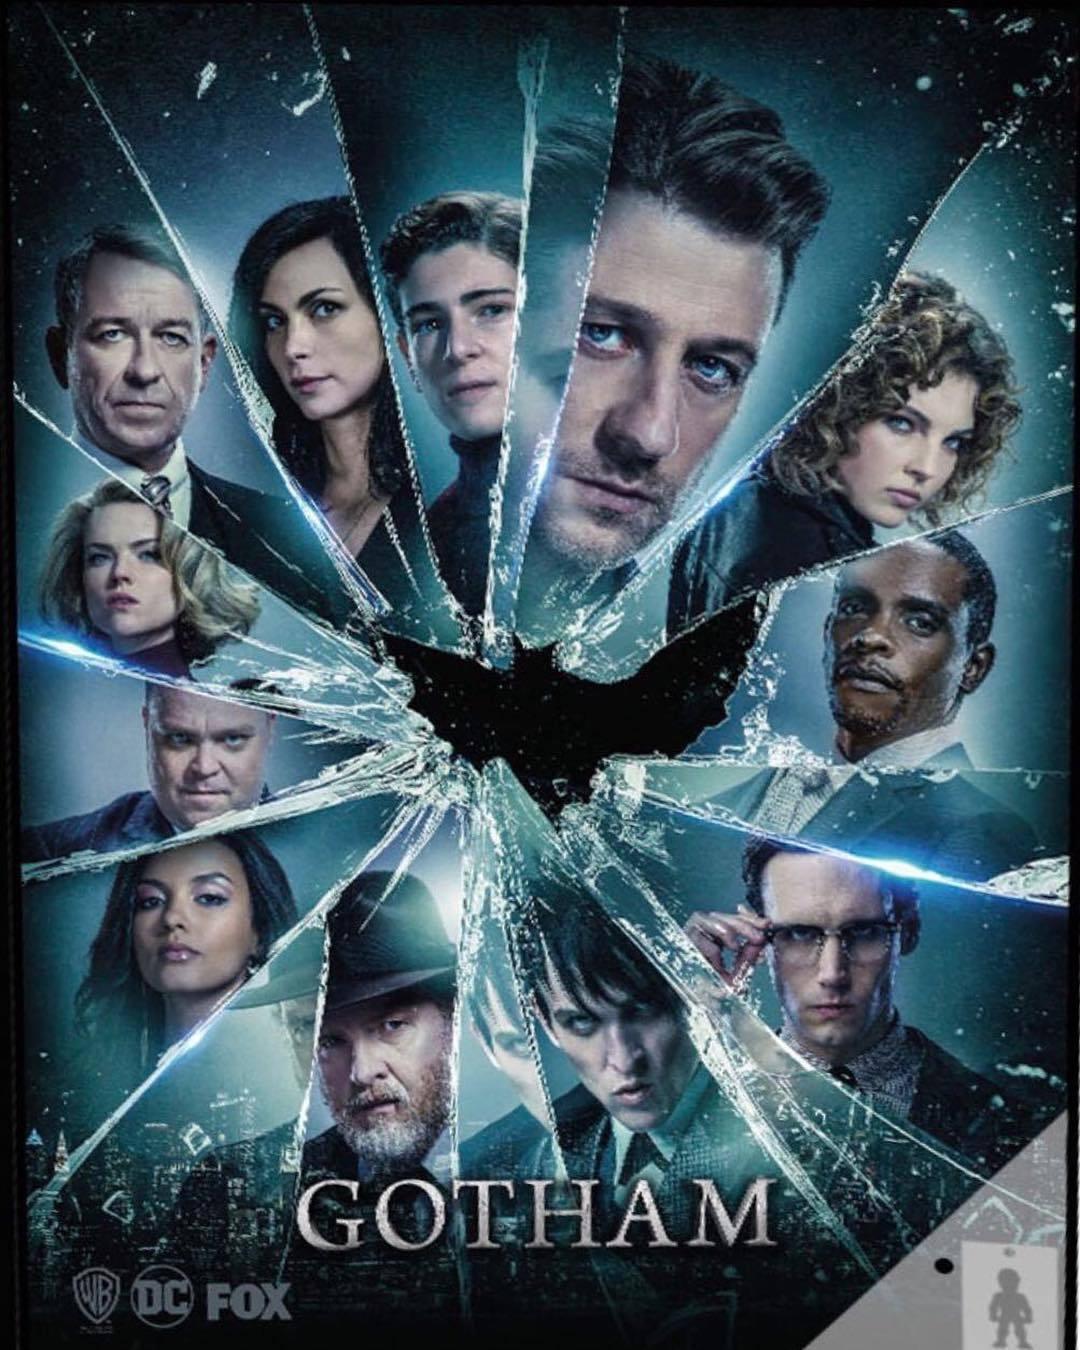 Gotham - Season 4 Poster